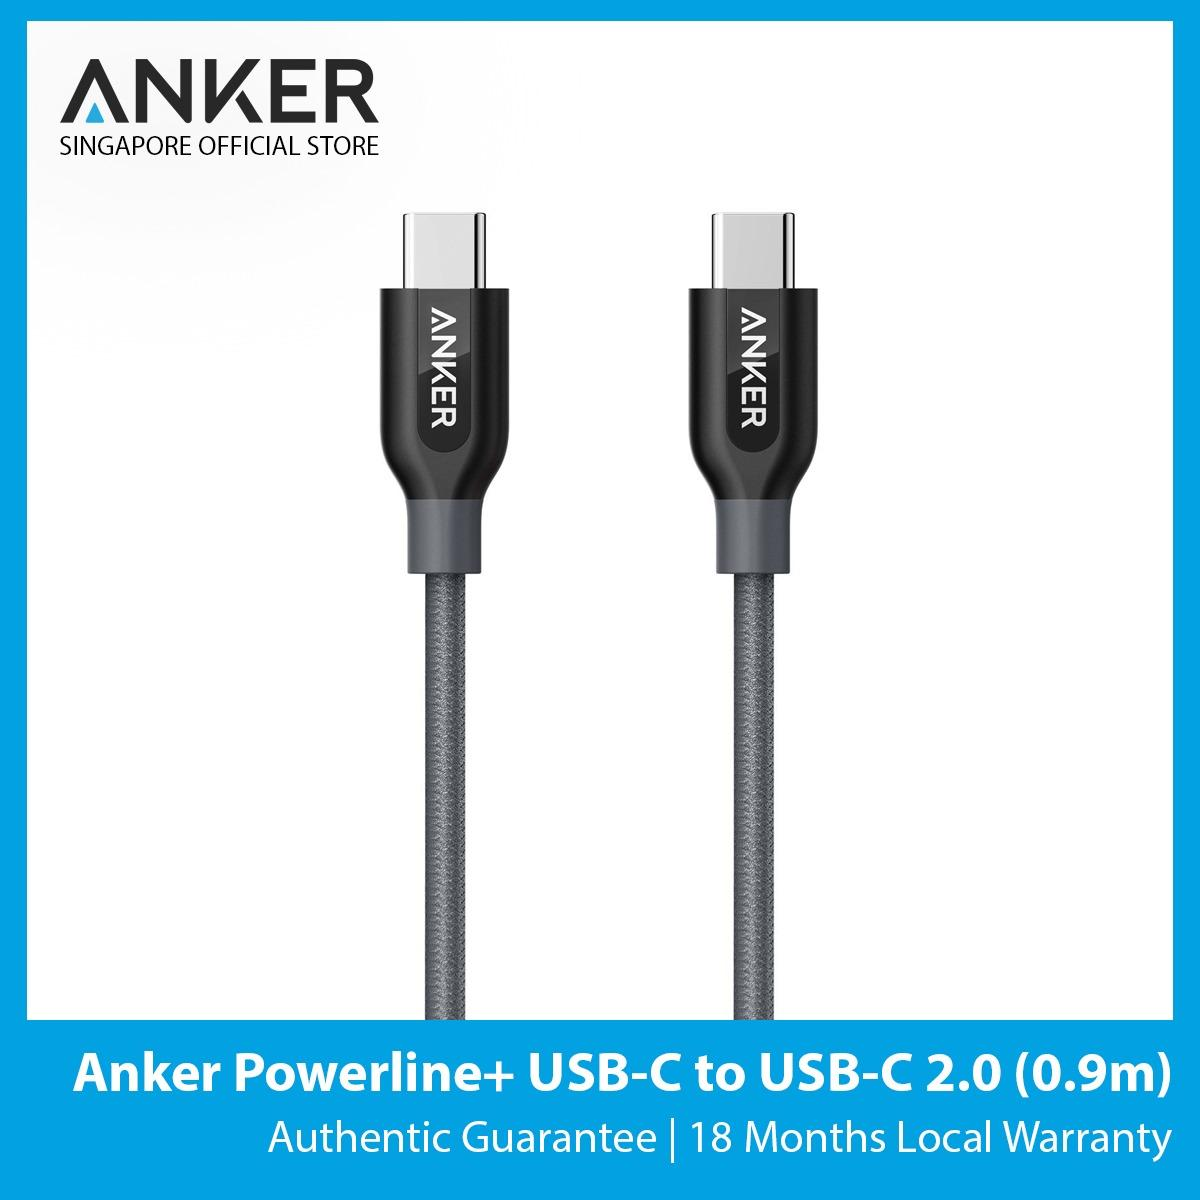 Buy Anker Powerline Usb C To Usb C 2 3Ft 9M Cheap Singapore